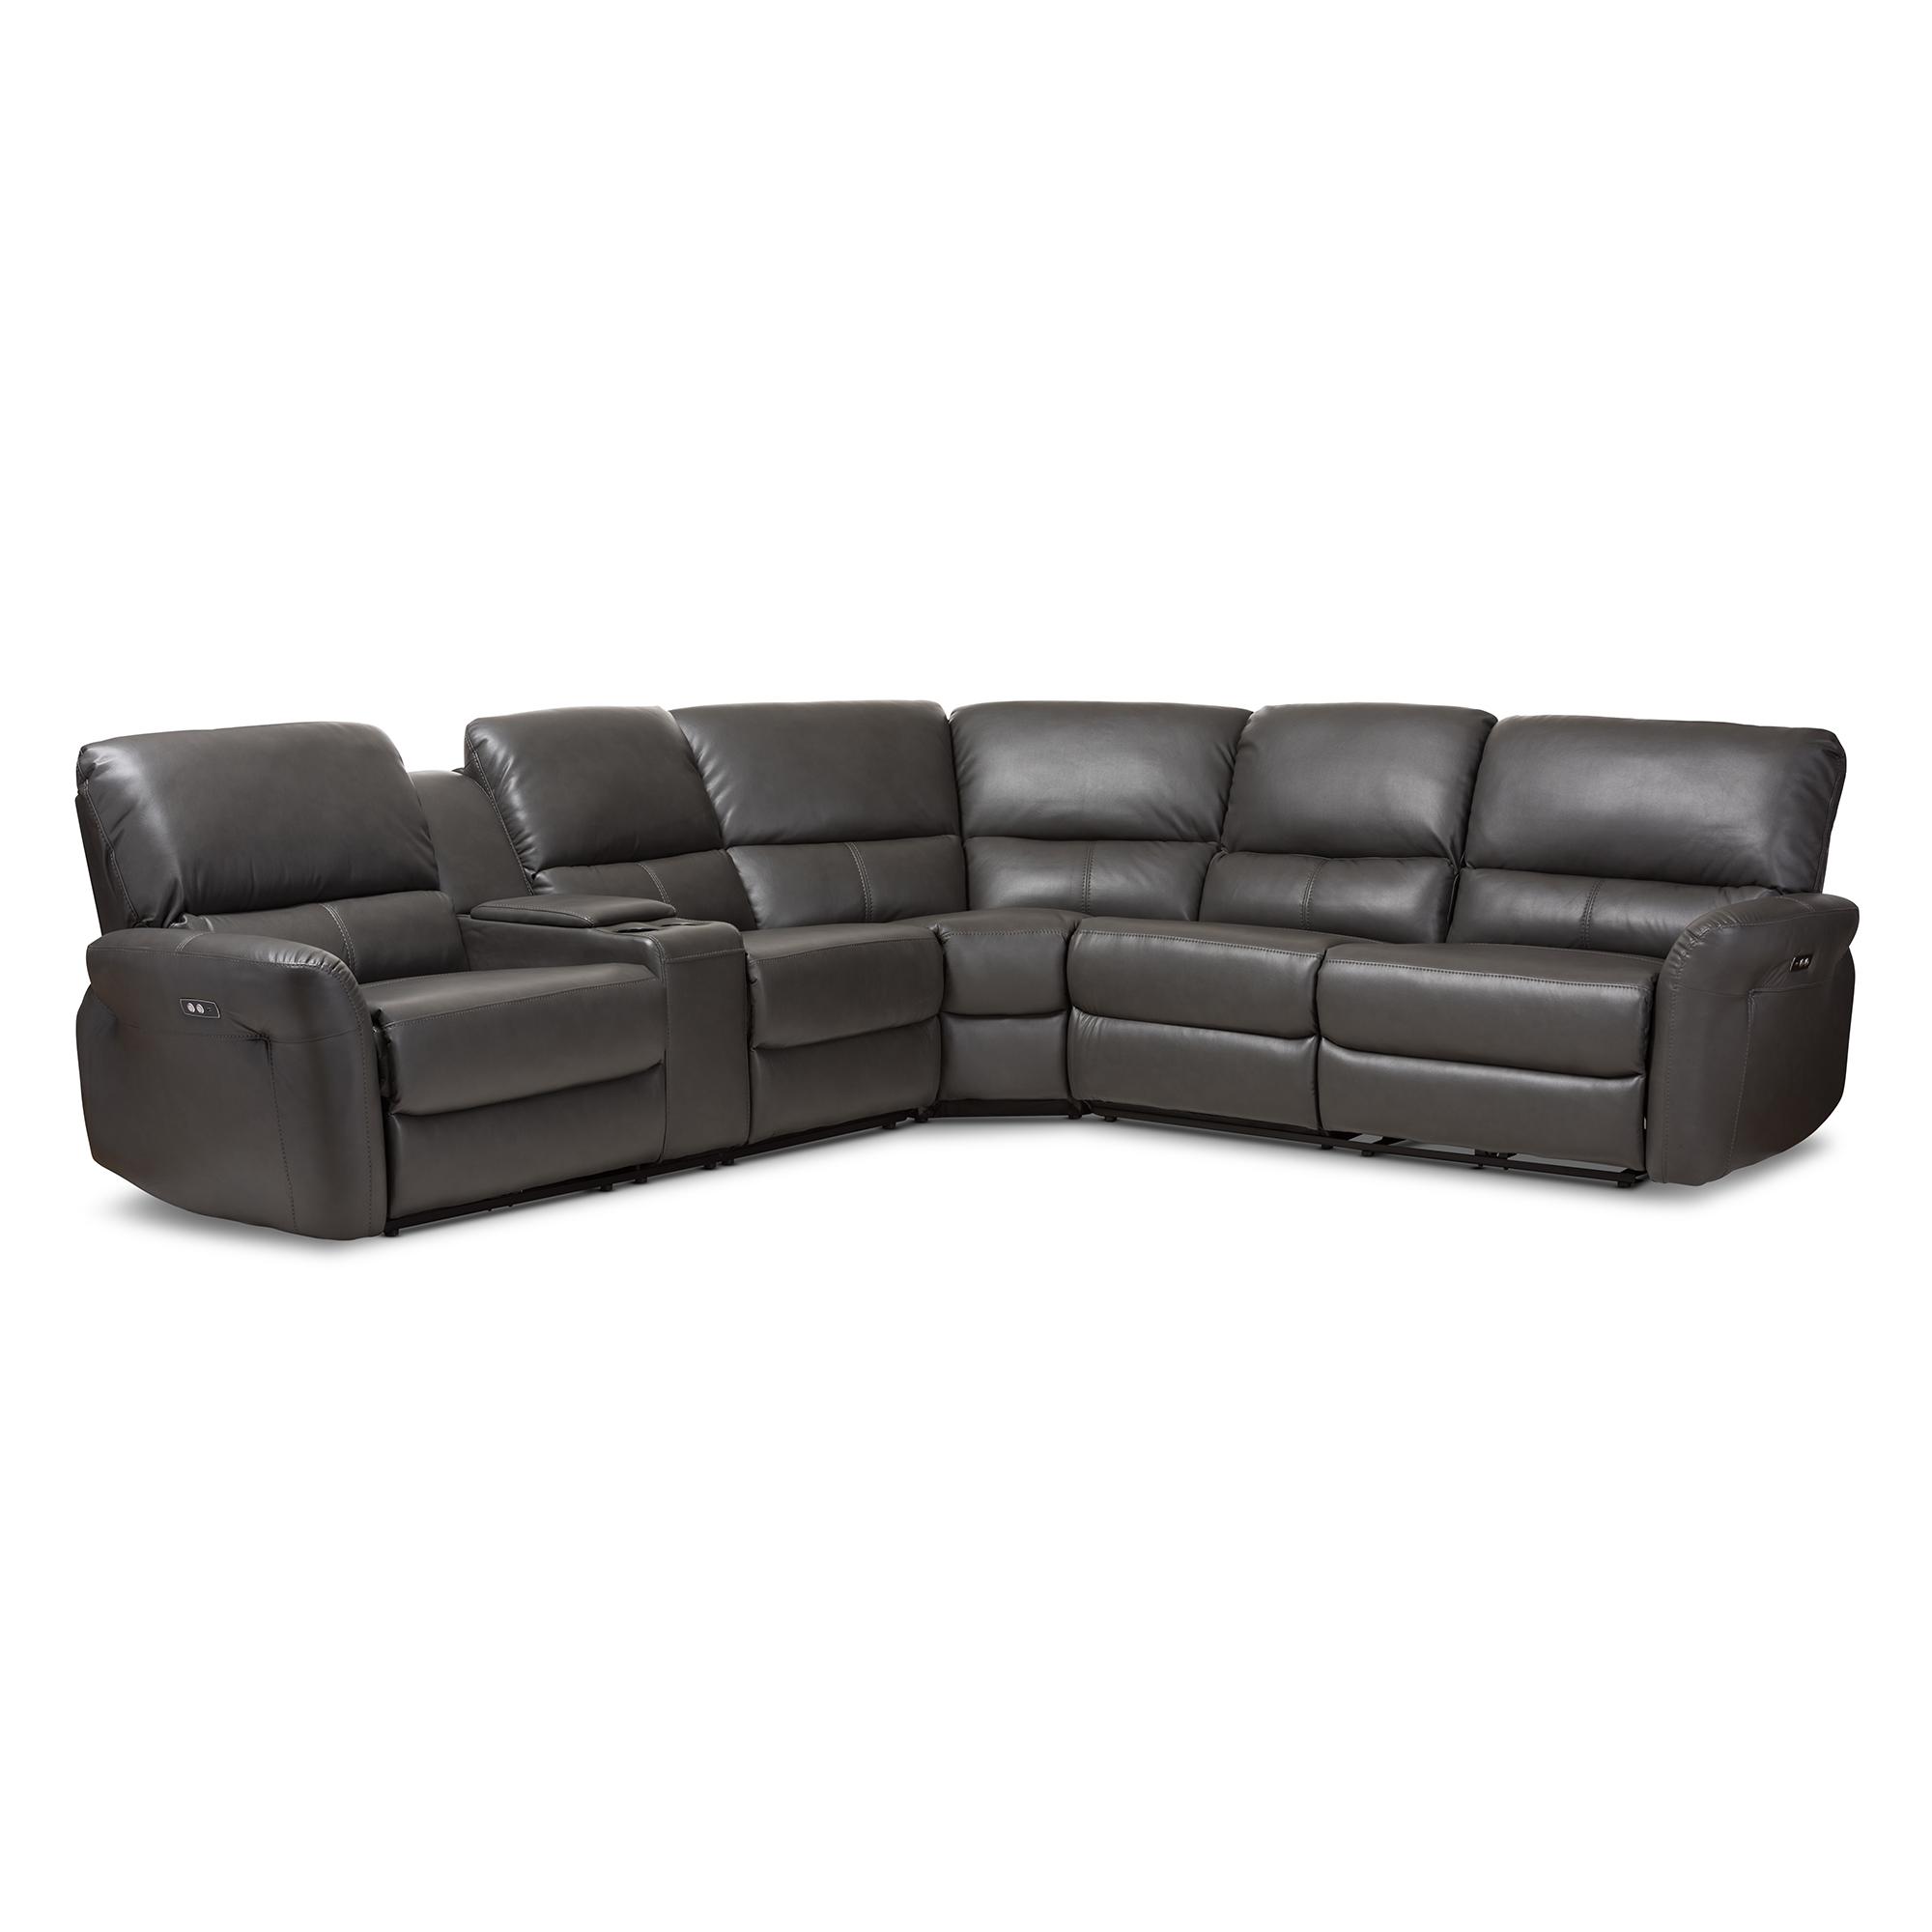 Amazing Baxton Studio Amaris Modern And Contemporary Grey Bonded Machost Co Dining Chair Design Ideas Machostcouk